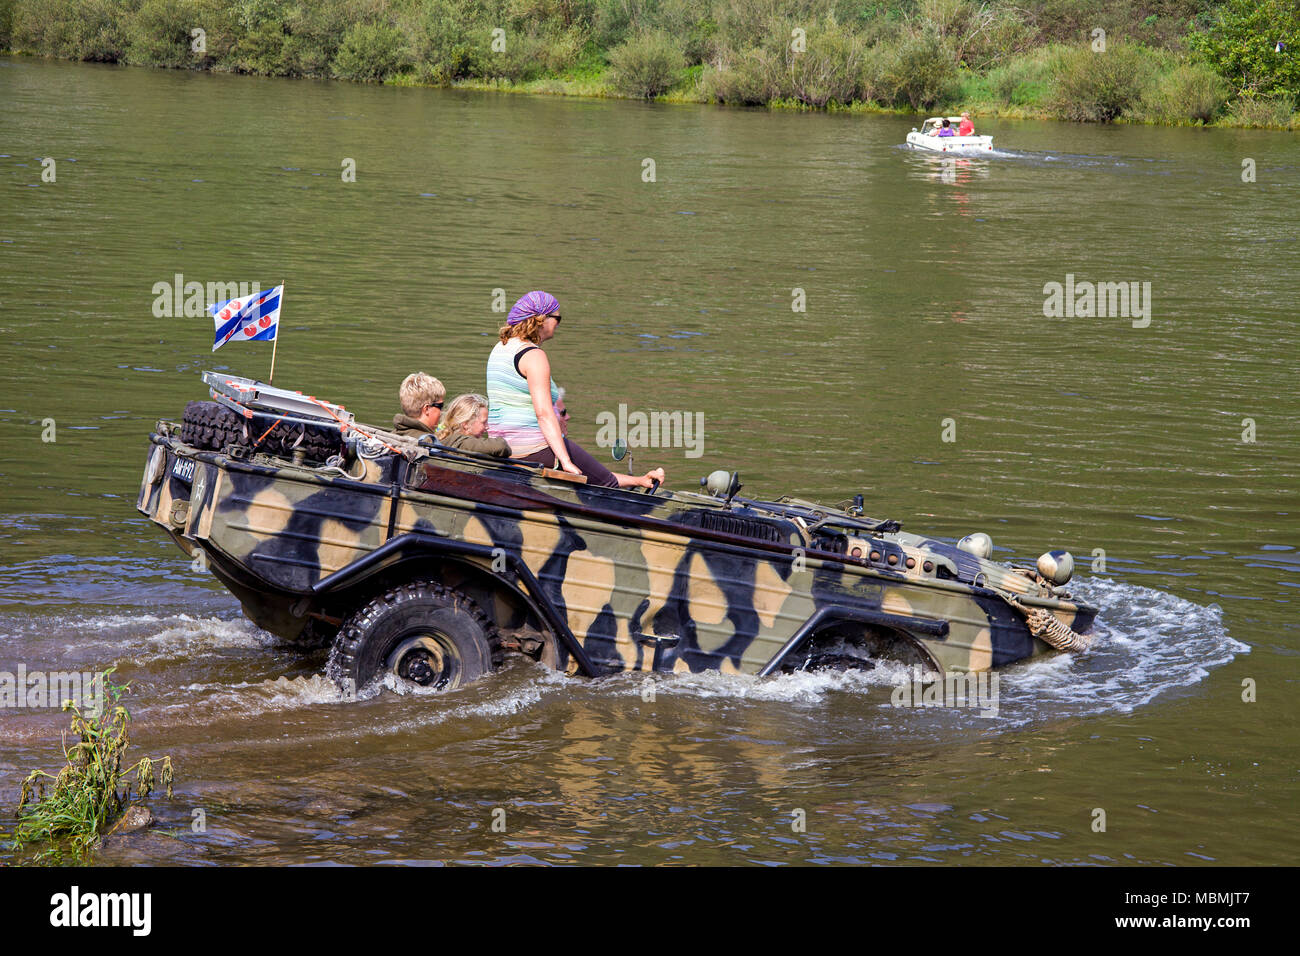 Military amphibious vehicle on Moselle river at Bruttig-Fankel, Rhineland-Palatinate, Germany Stock Photo